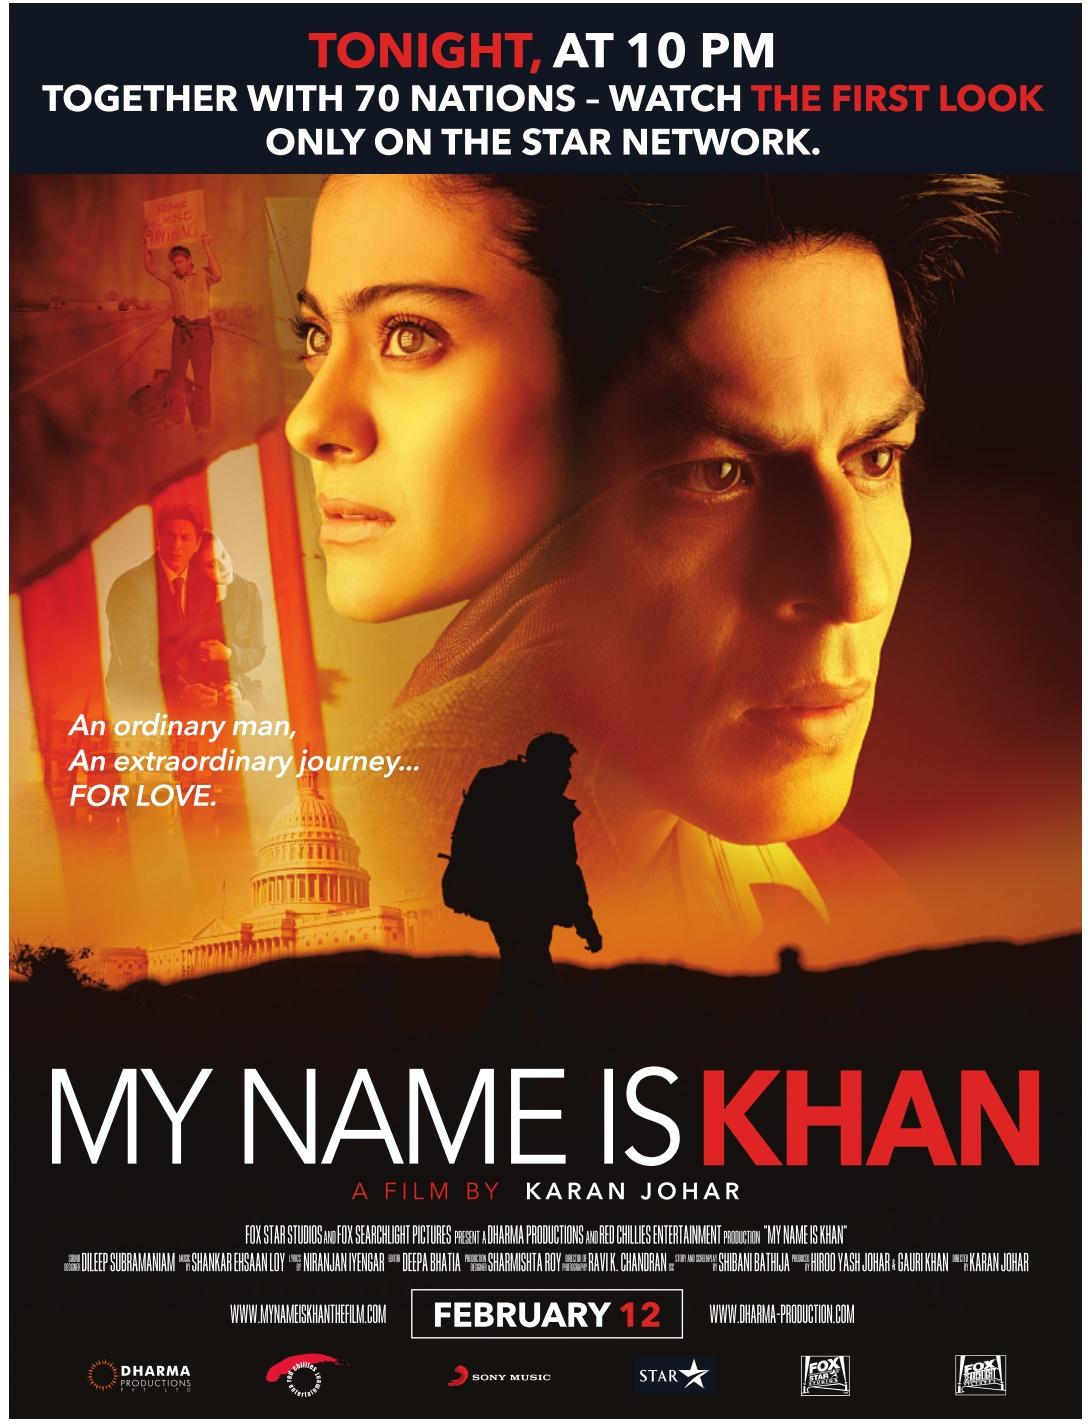 jonny u0026 39 s movee  movie review   my name is khan  2010